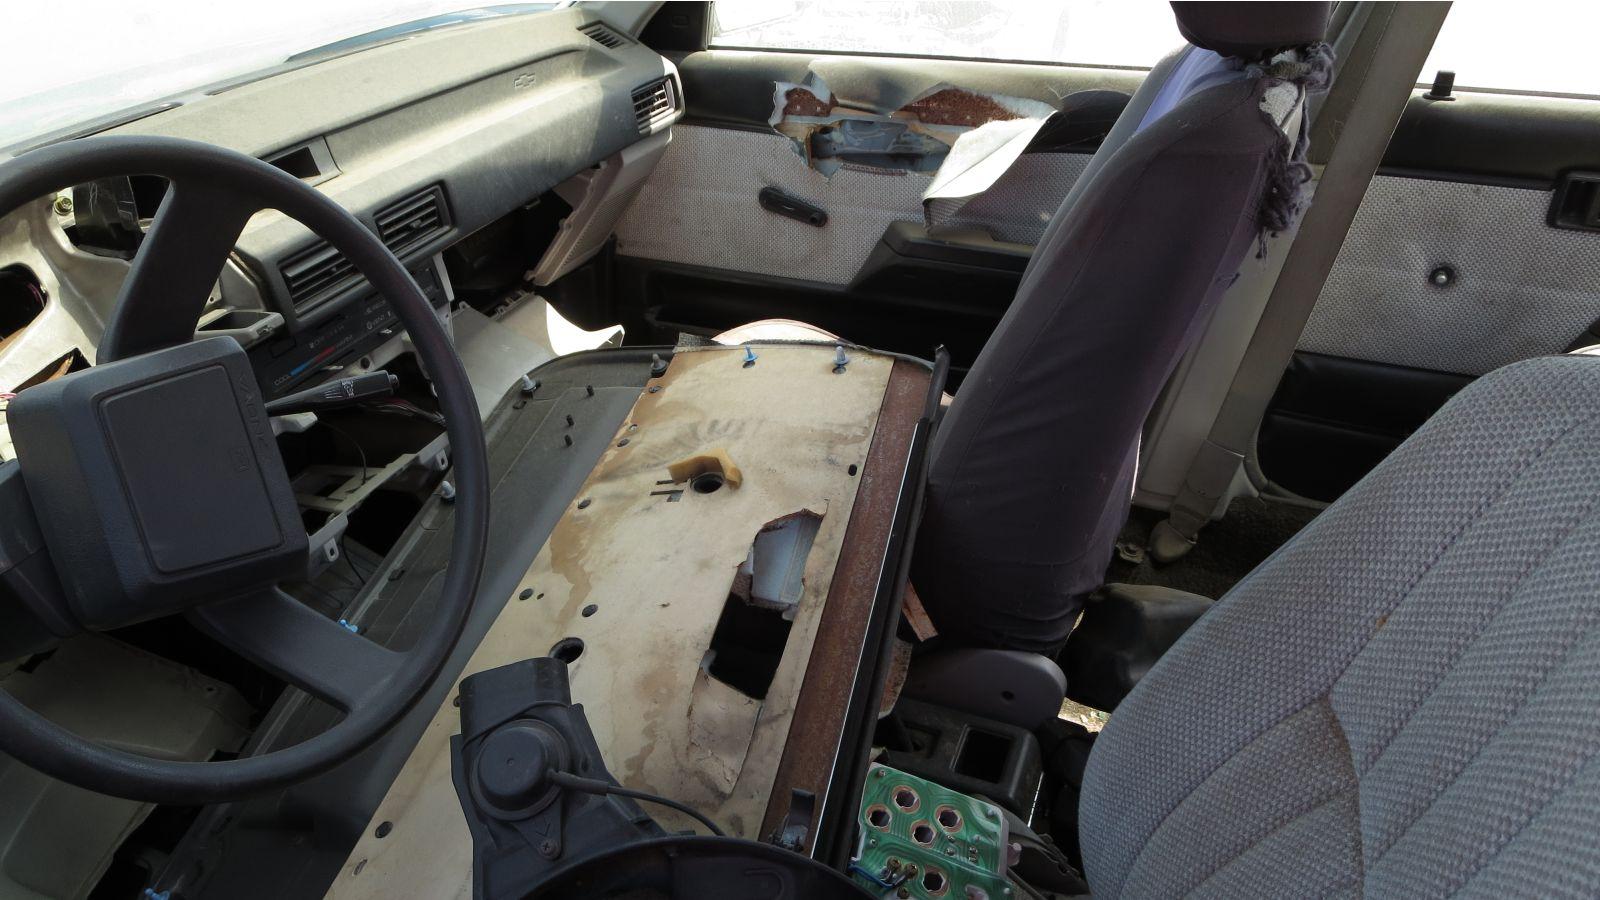 Junkyard Gem: 1988 Chevy Nova Sedan | Autoblog